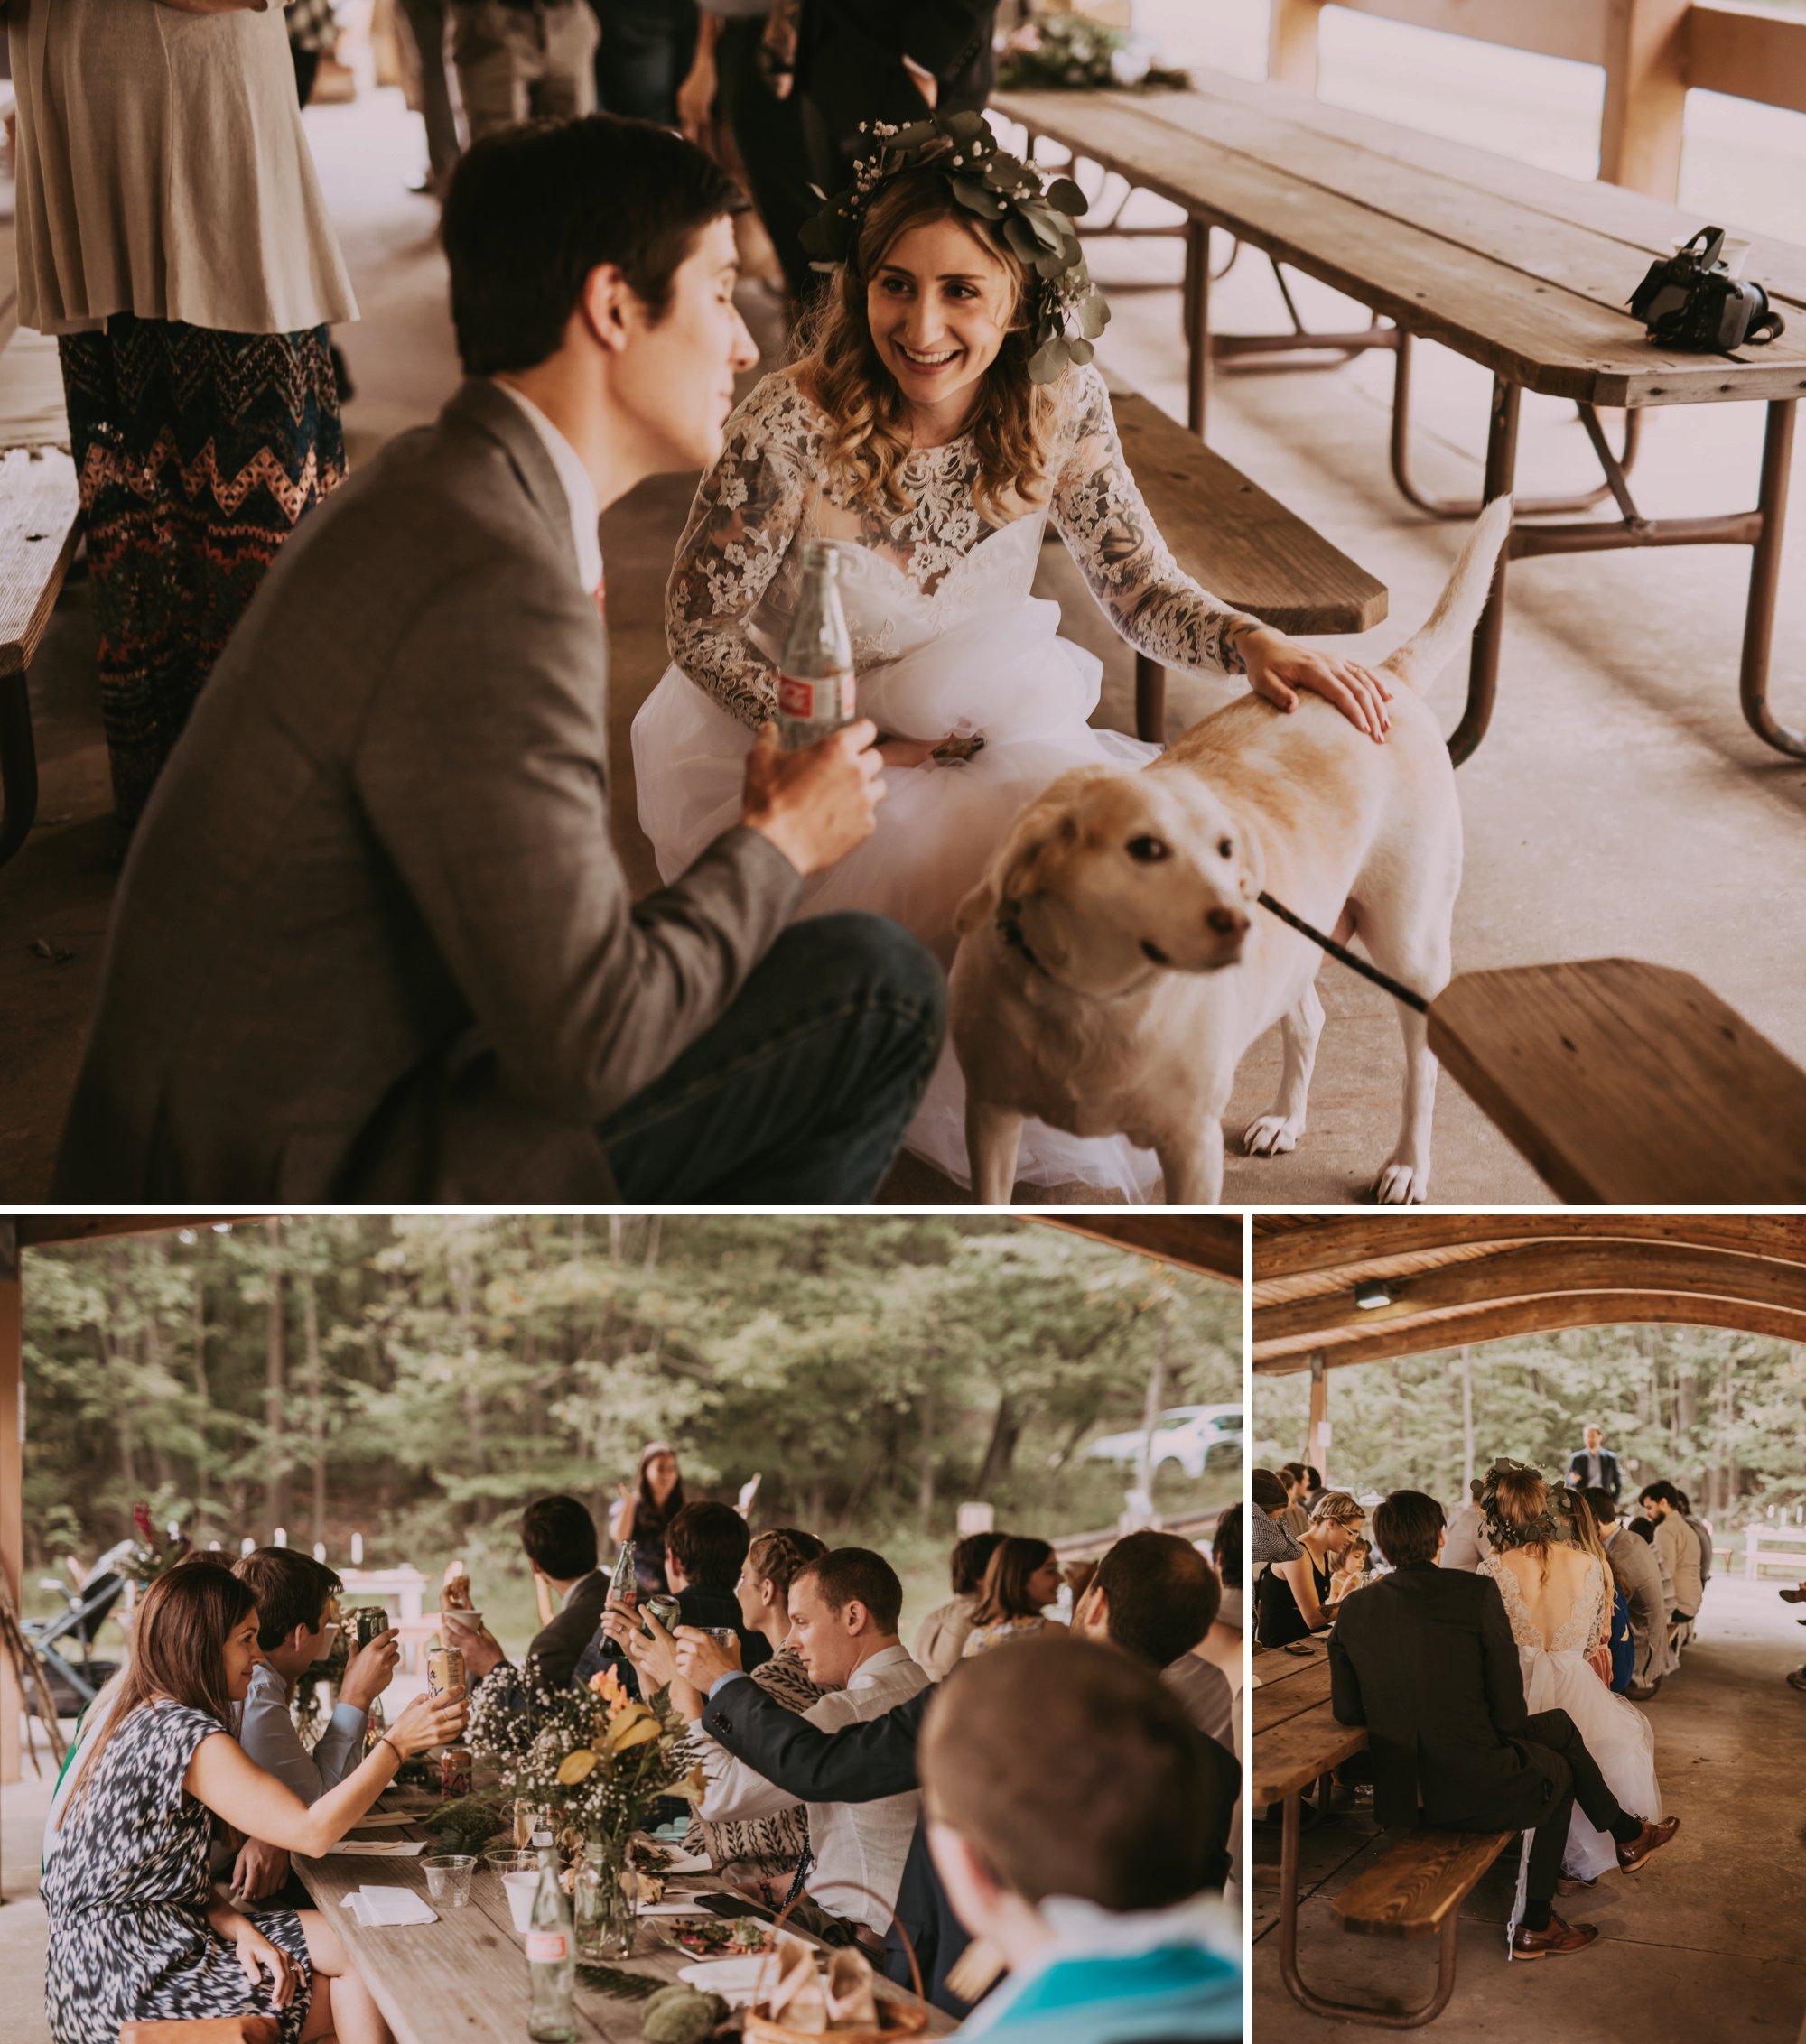 Rustic Intimate Vegan Forest Wedding with Handmade Dress. Reception